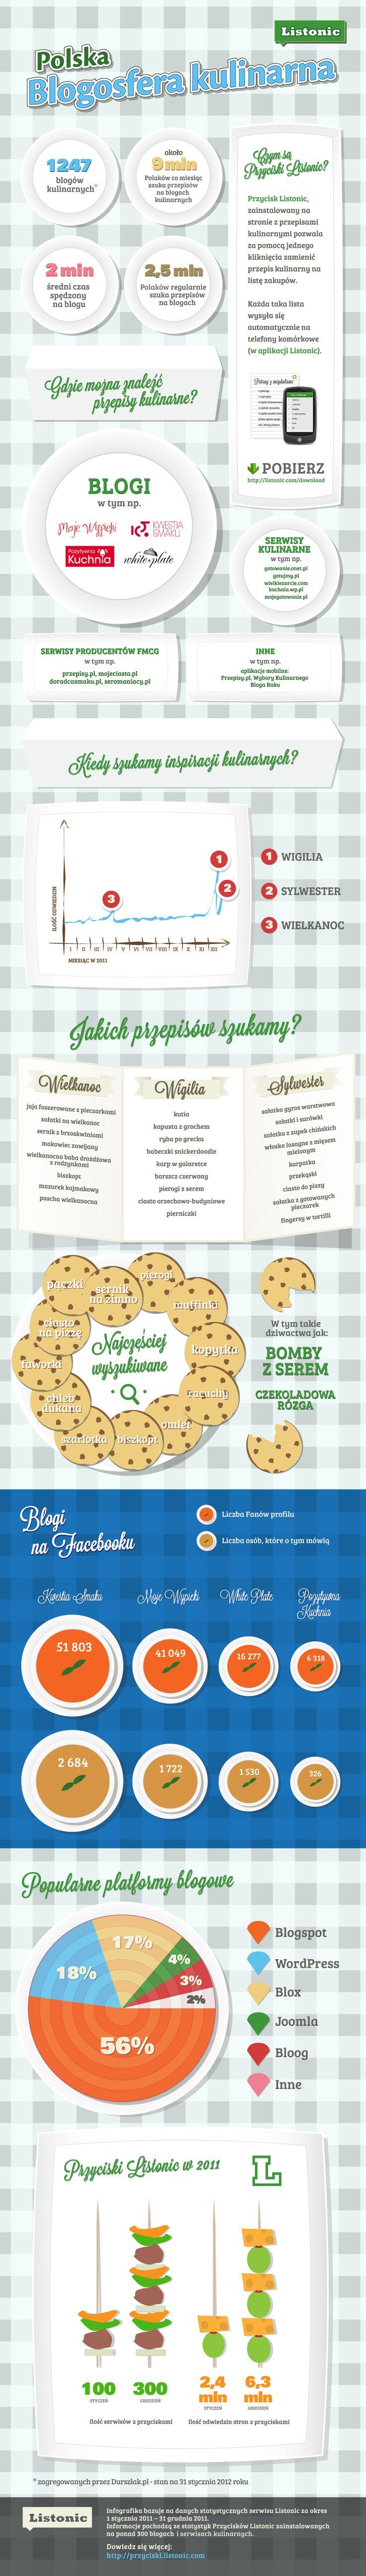 Polska blogosfera kulinarna  (oraz Przyciski Listonic)